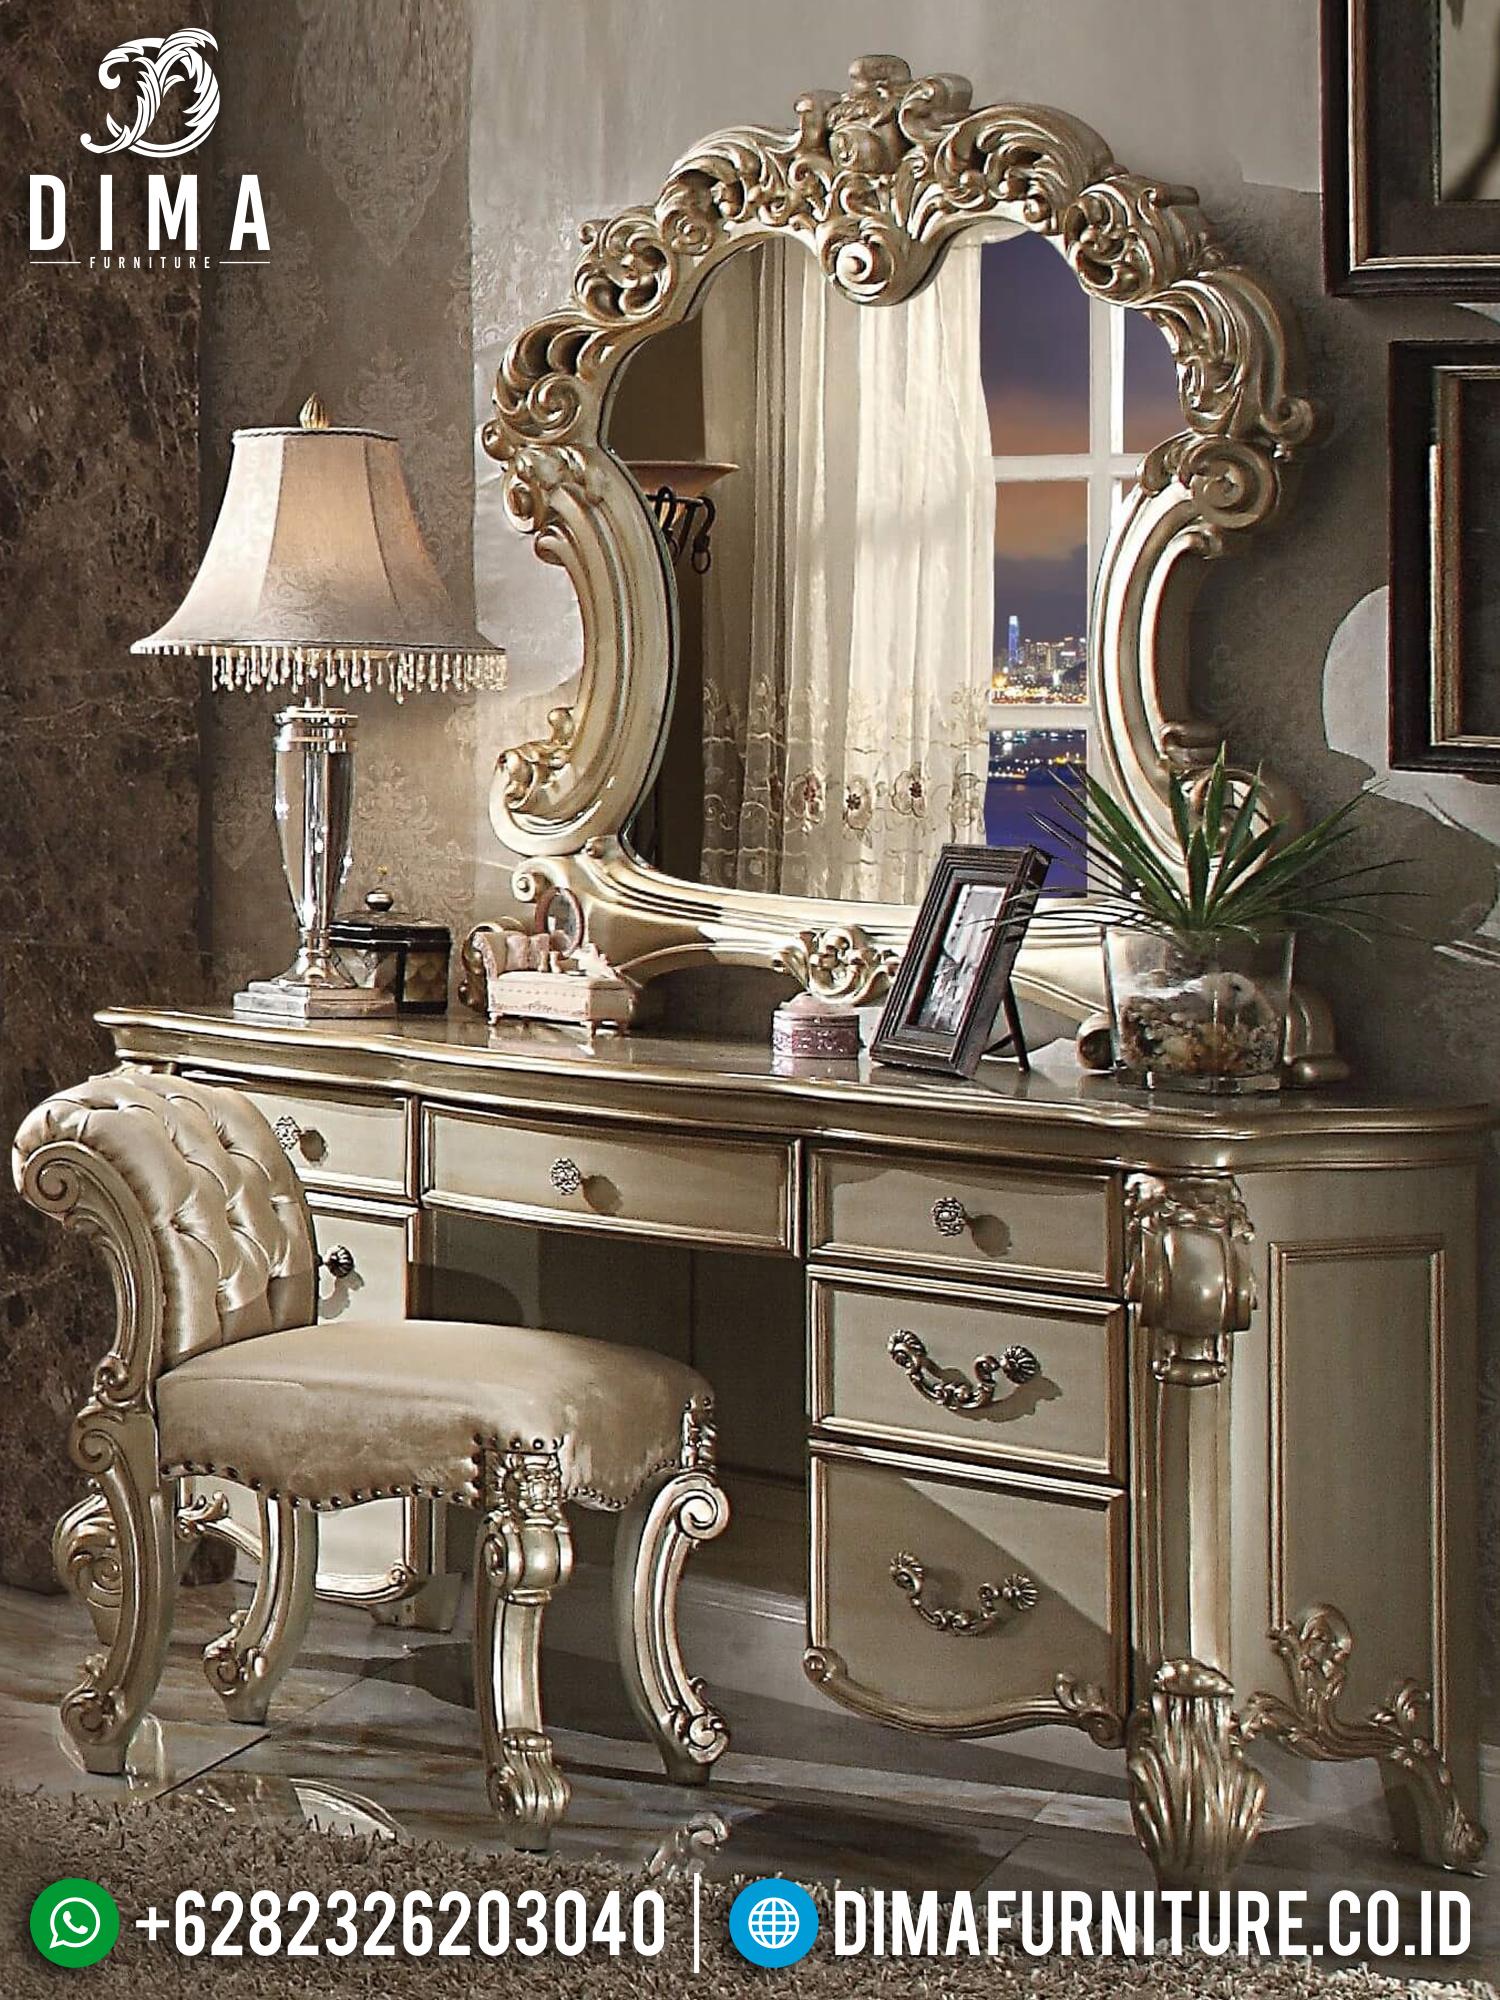 Golden Champagne Meja Rias Ukiran Classic Luxury New Furniture Jepara BT-0897